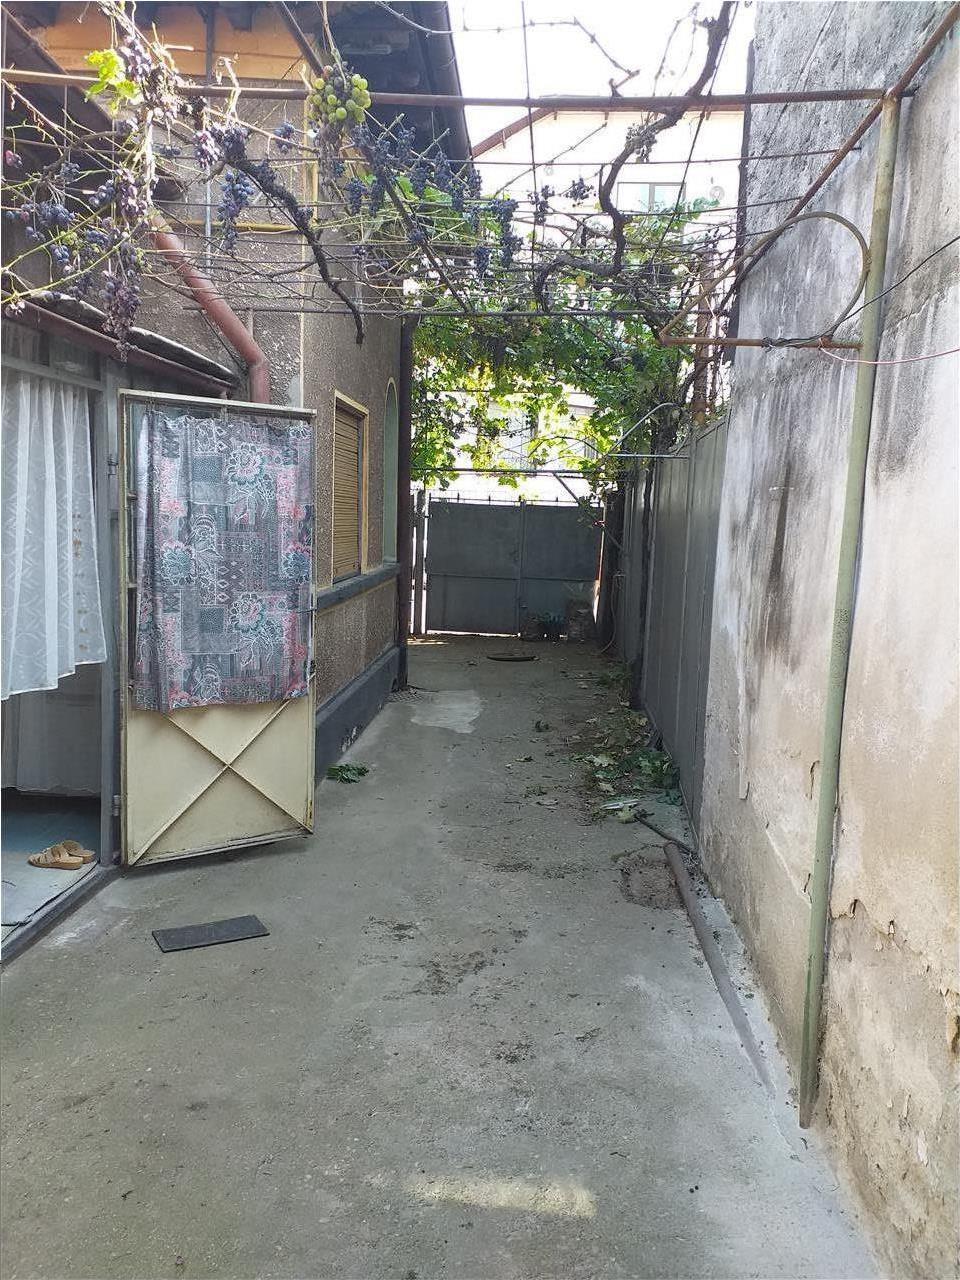 Vanzare Casa  Batraneasca152mp teren Ion Mihalache/Domenii